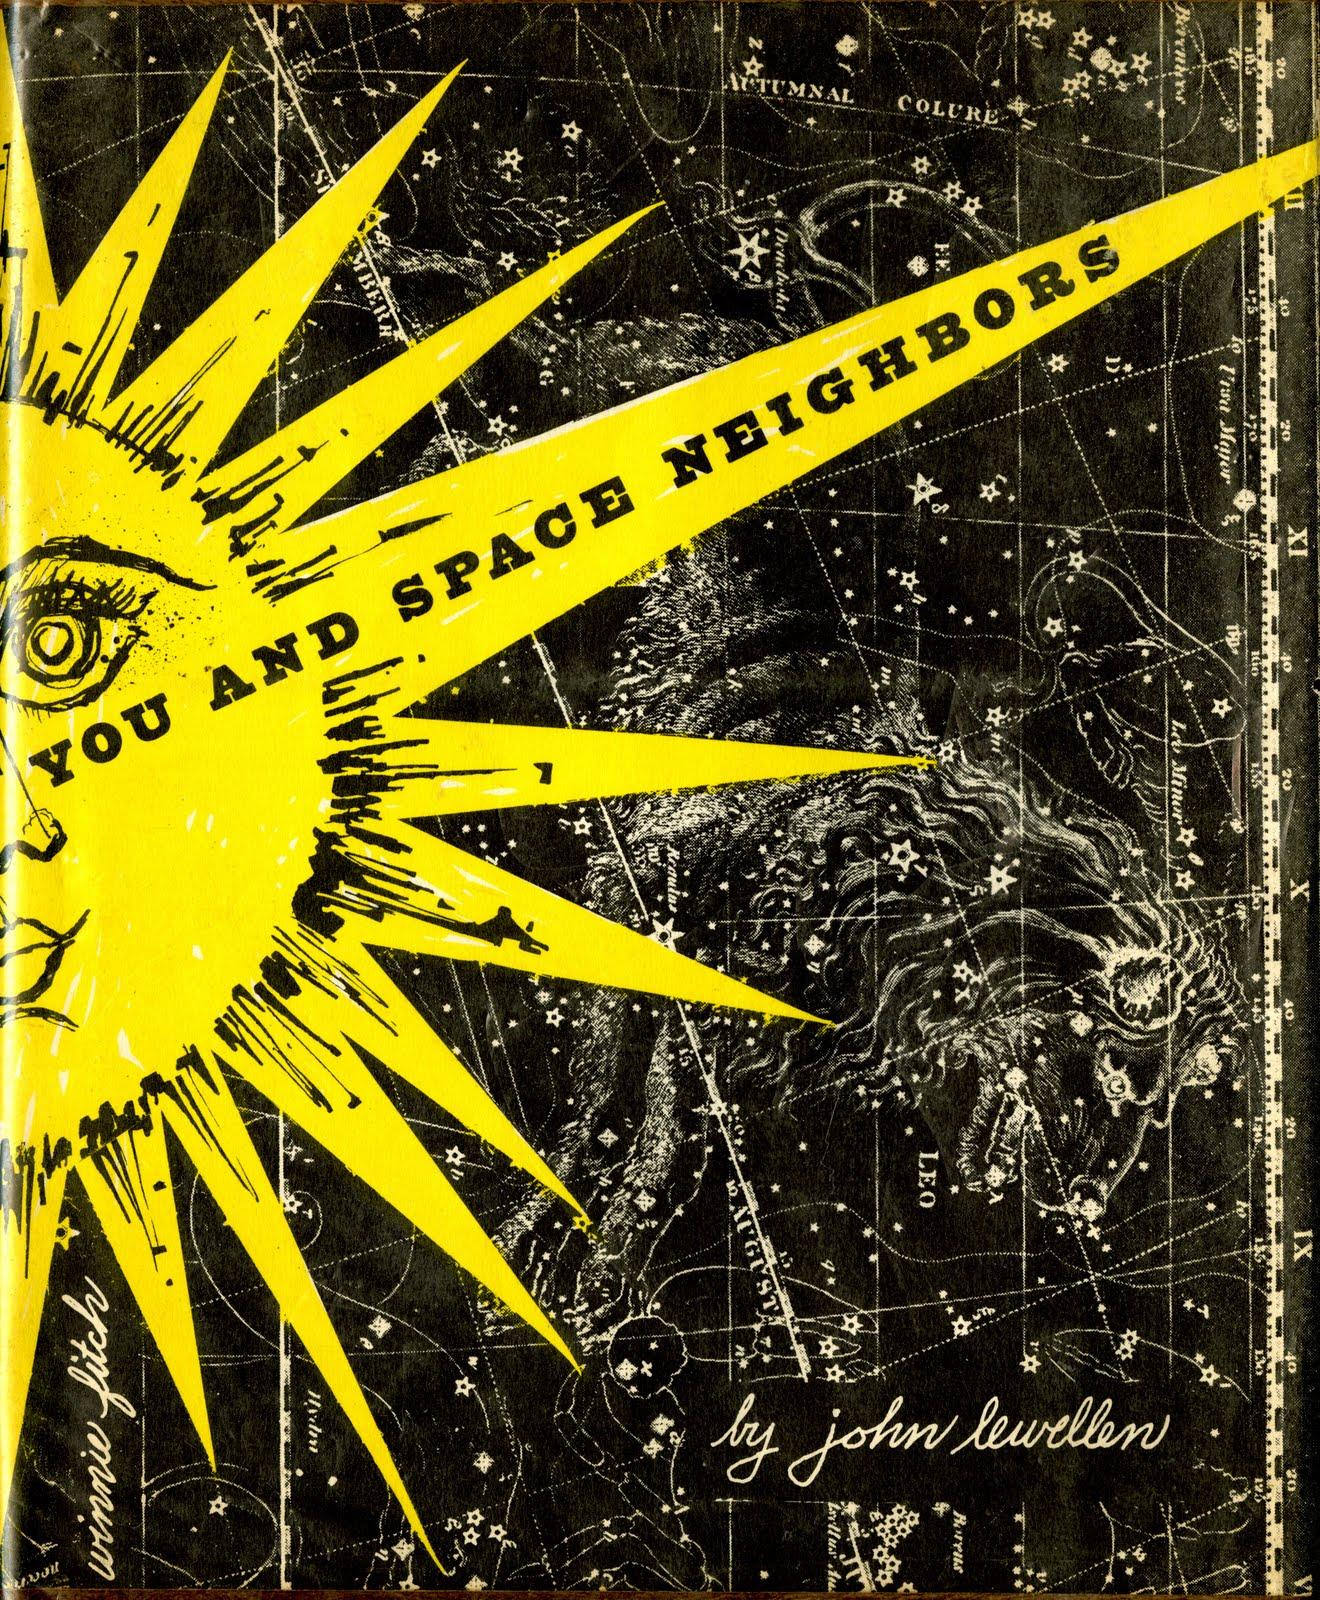 You and Space Neighbors by John Lewellen 1953 via letterology.com